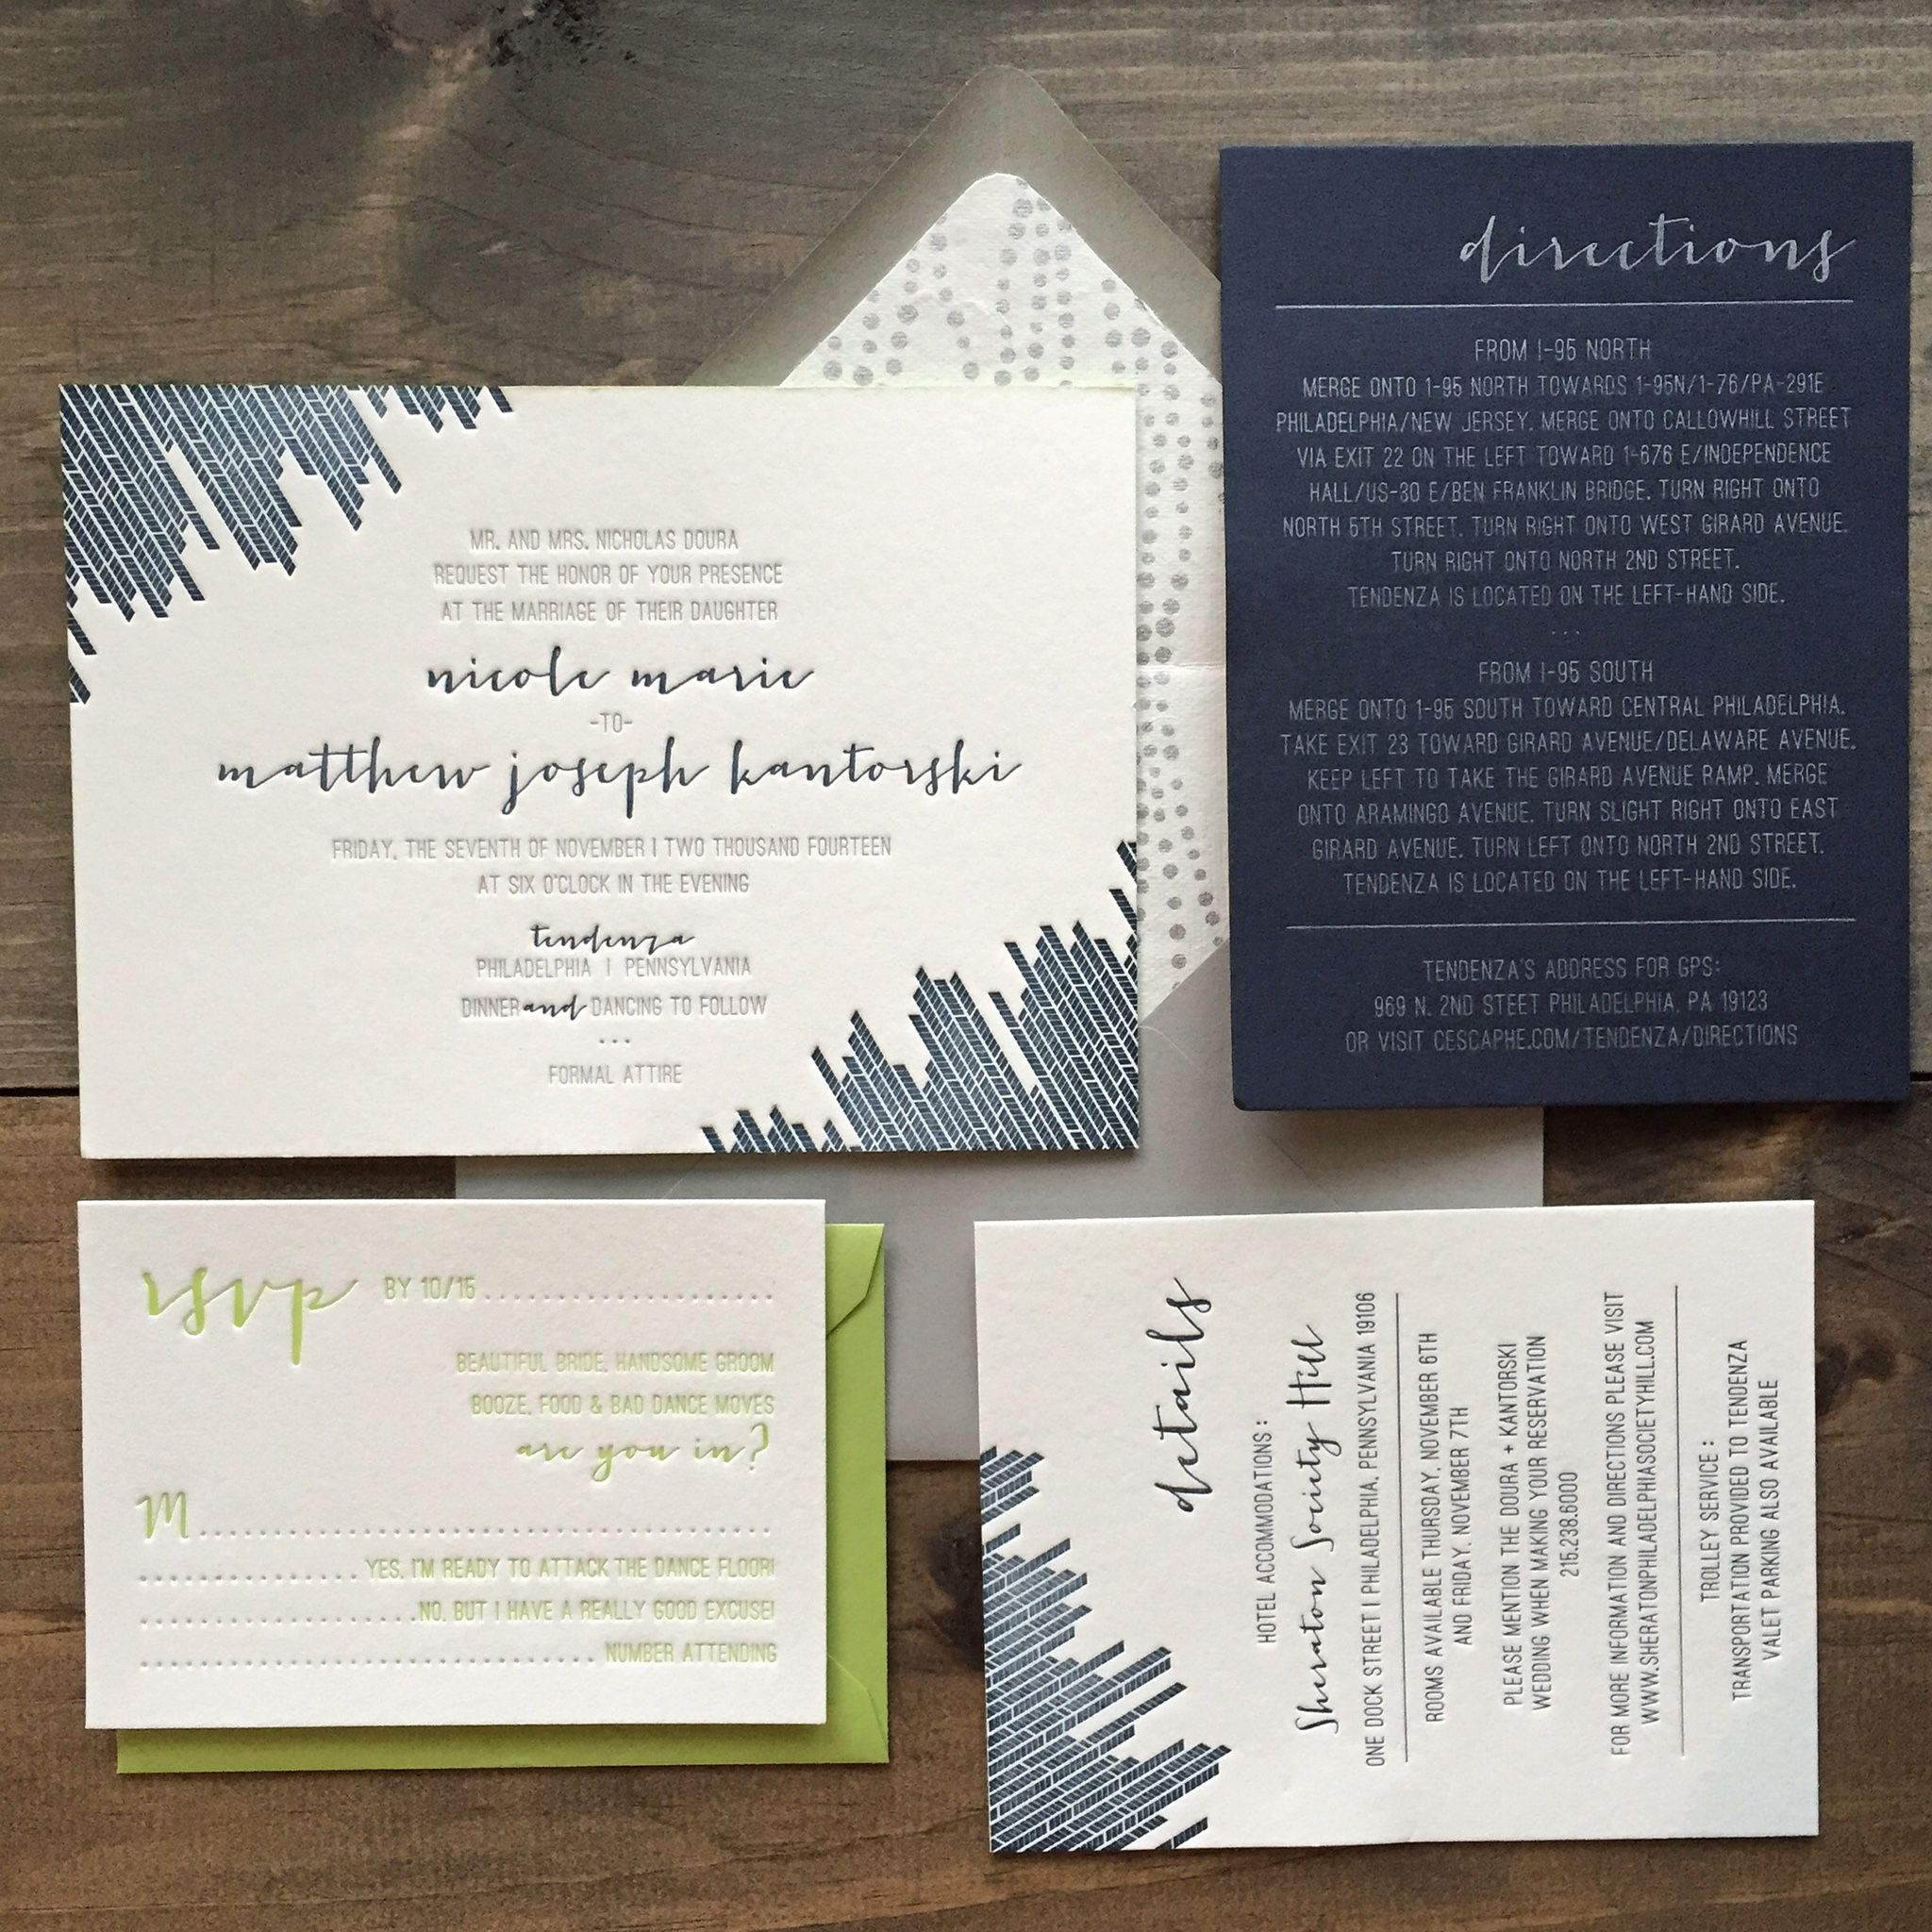 Darlingandpearl design collaboration with mvogel darlingandpearl design collaboration with mvogel letterpress wedding invitations philadelphia monicamarmolfo Choice Image